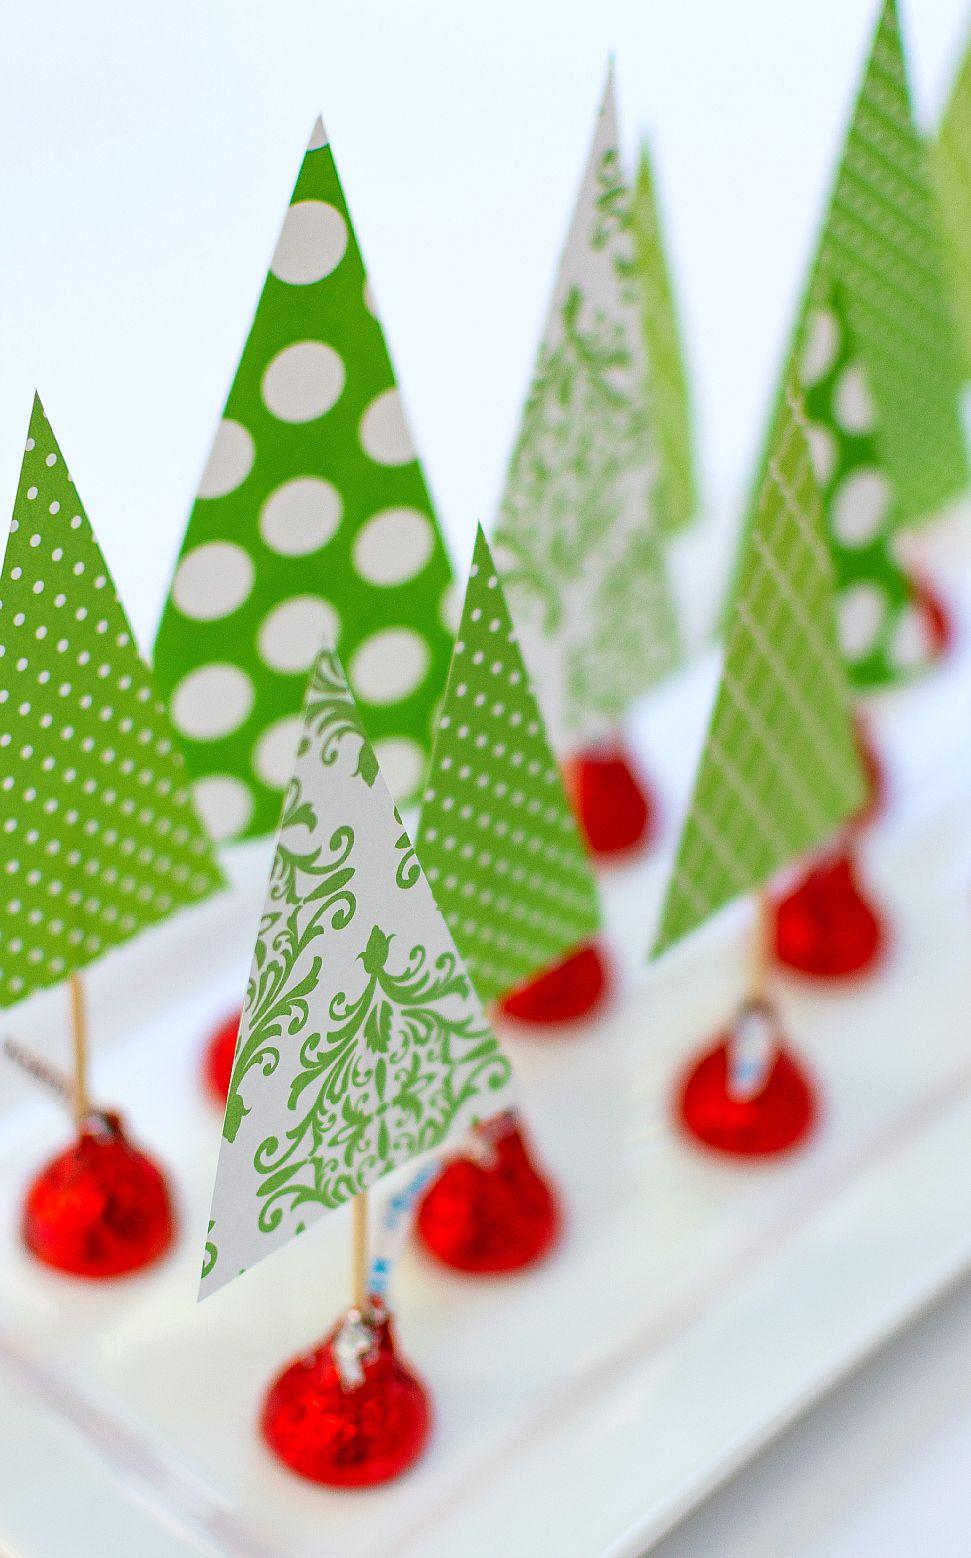 10 Best Christmas Craft Ideas On Pinterest christmas crafts with kids craft ideas pinterest christmas 2020